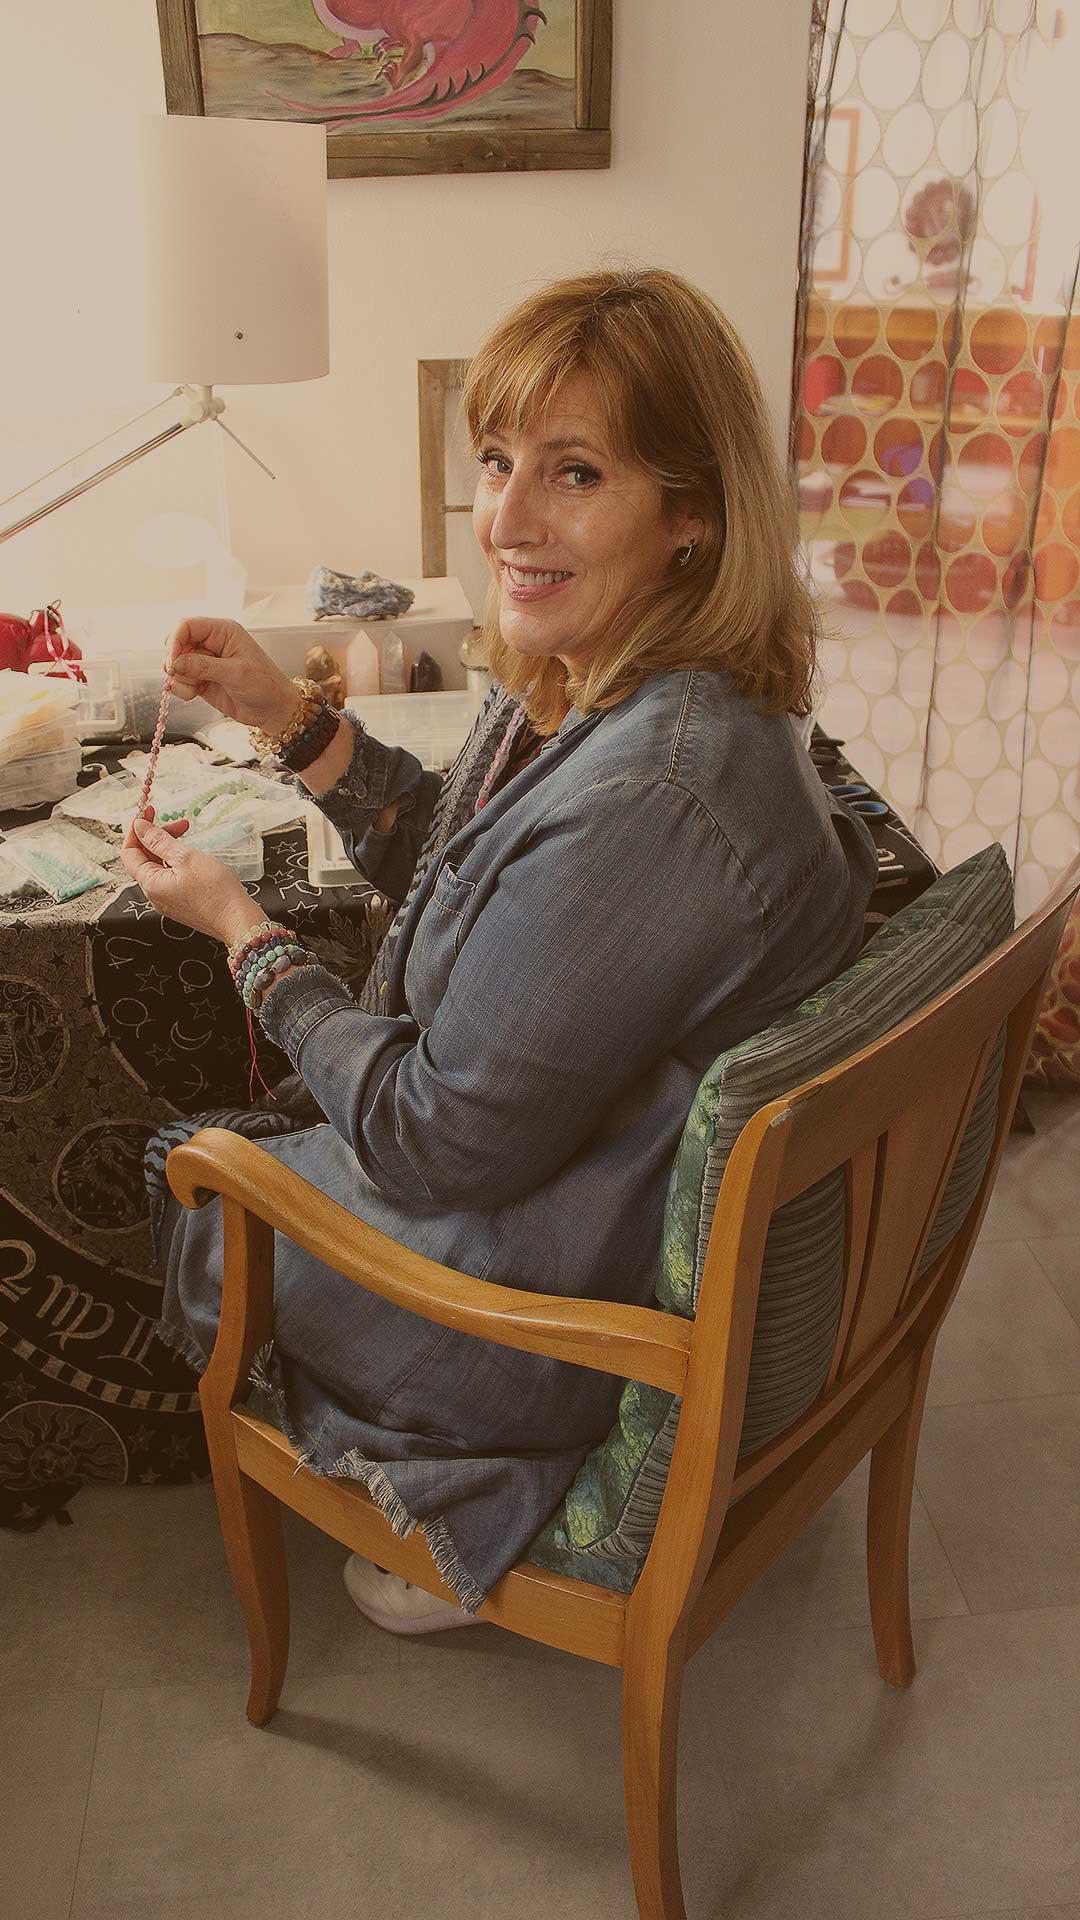 A photo of Catherine Regan making bracelets